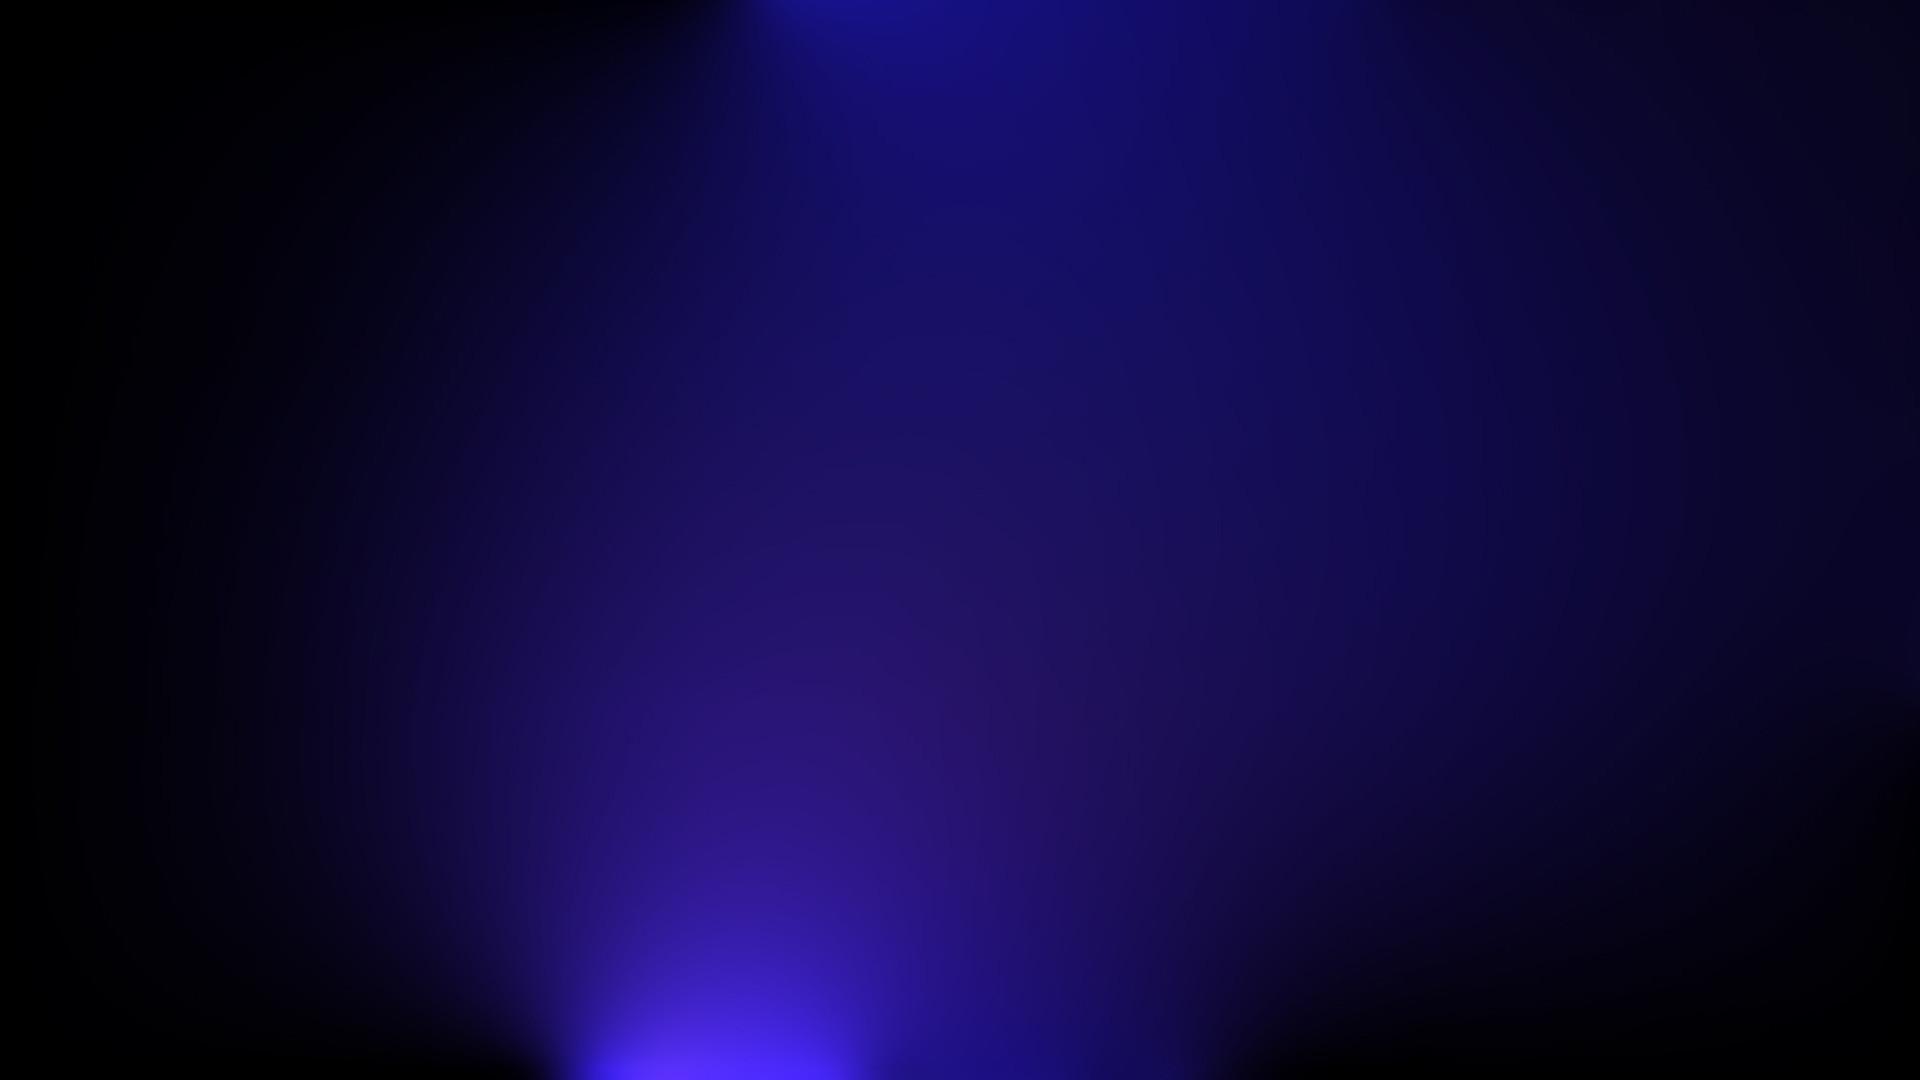 navy blue image